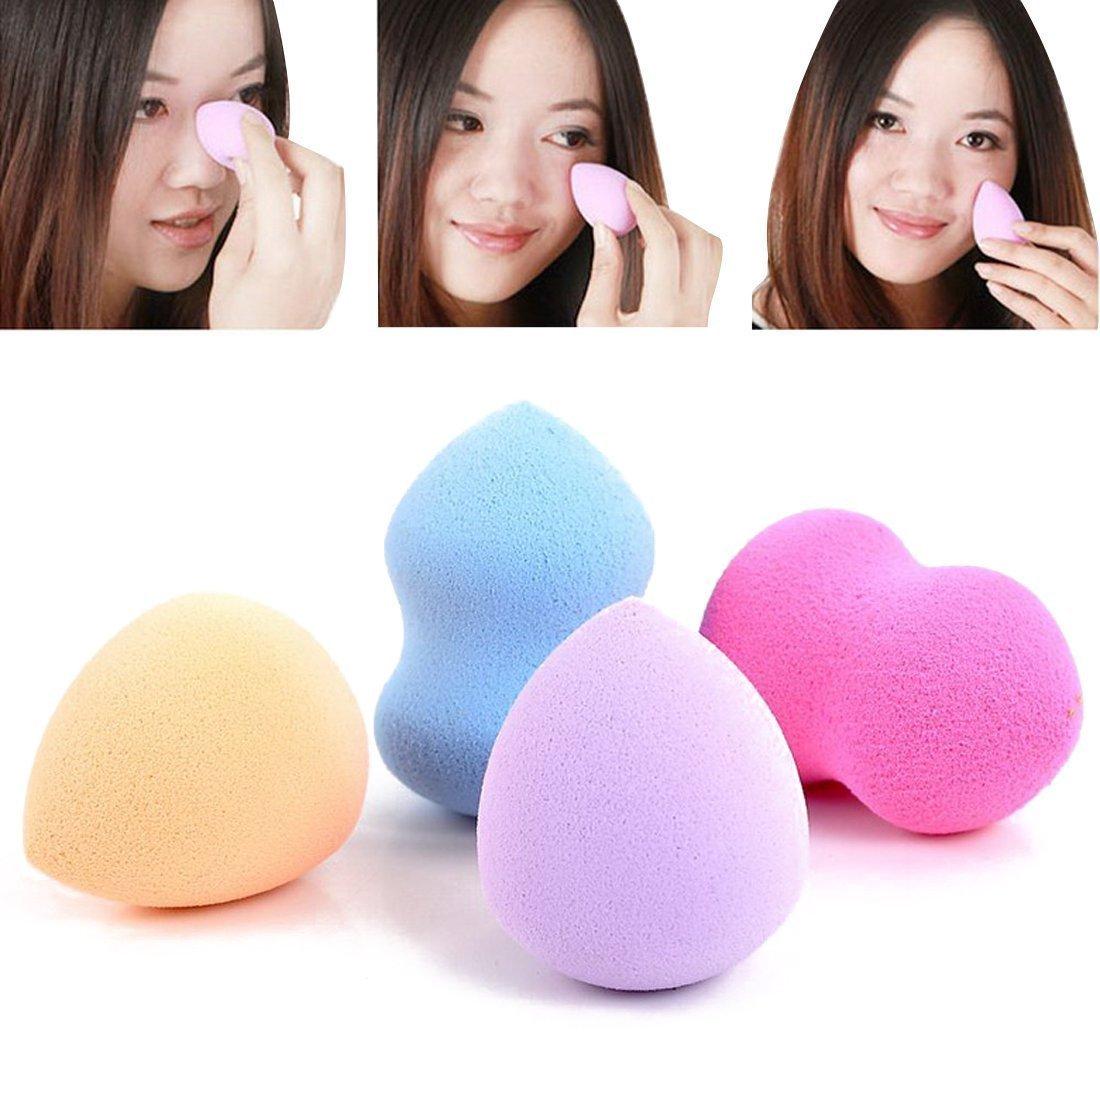 BeautyLife 4pc Pro Beauty Flawless Makeup Blender Foundation Puff Multi Shape Sponges Color by Random FMISSACGHJH564